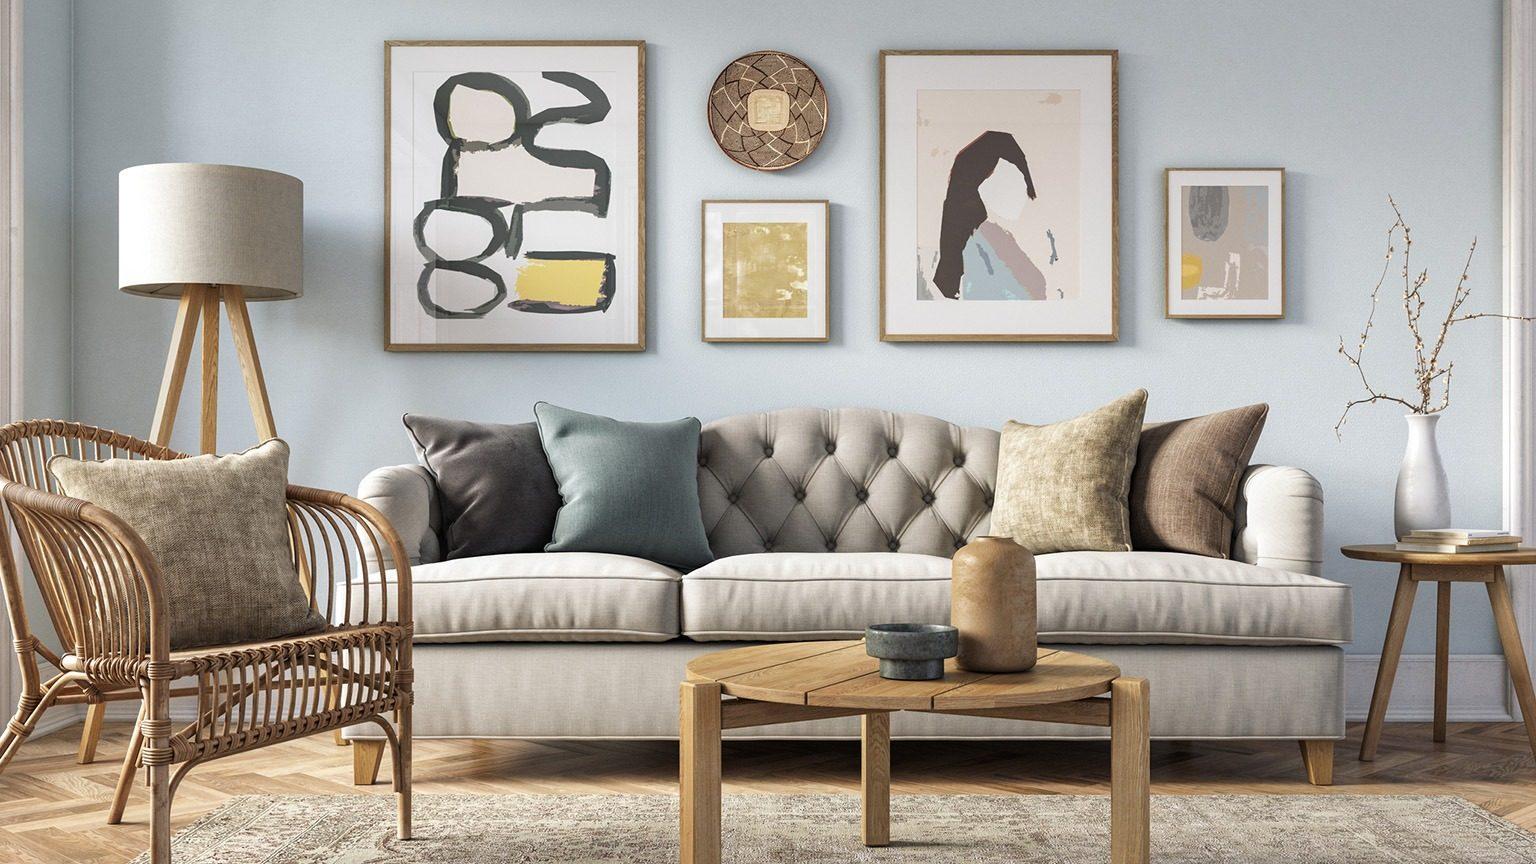 Art works on living room